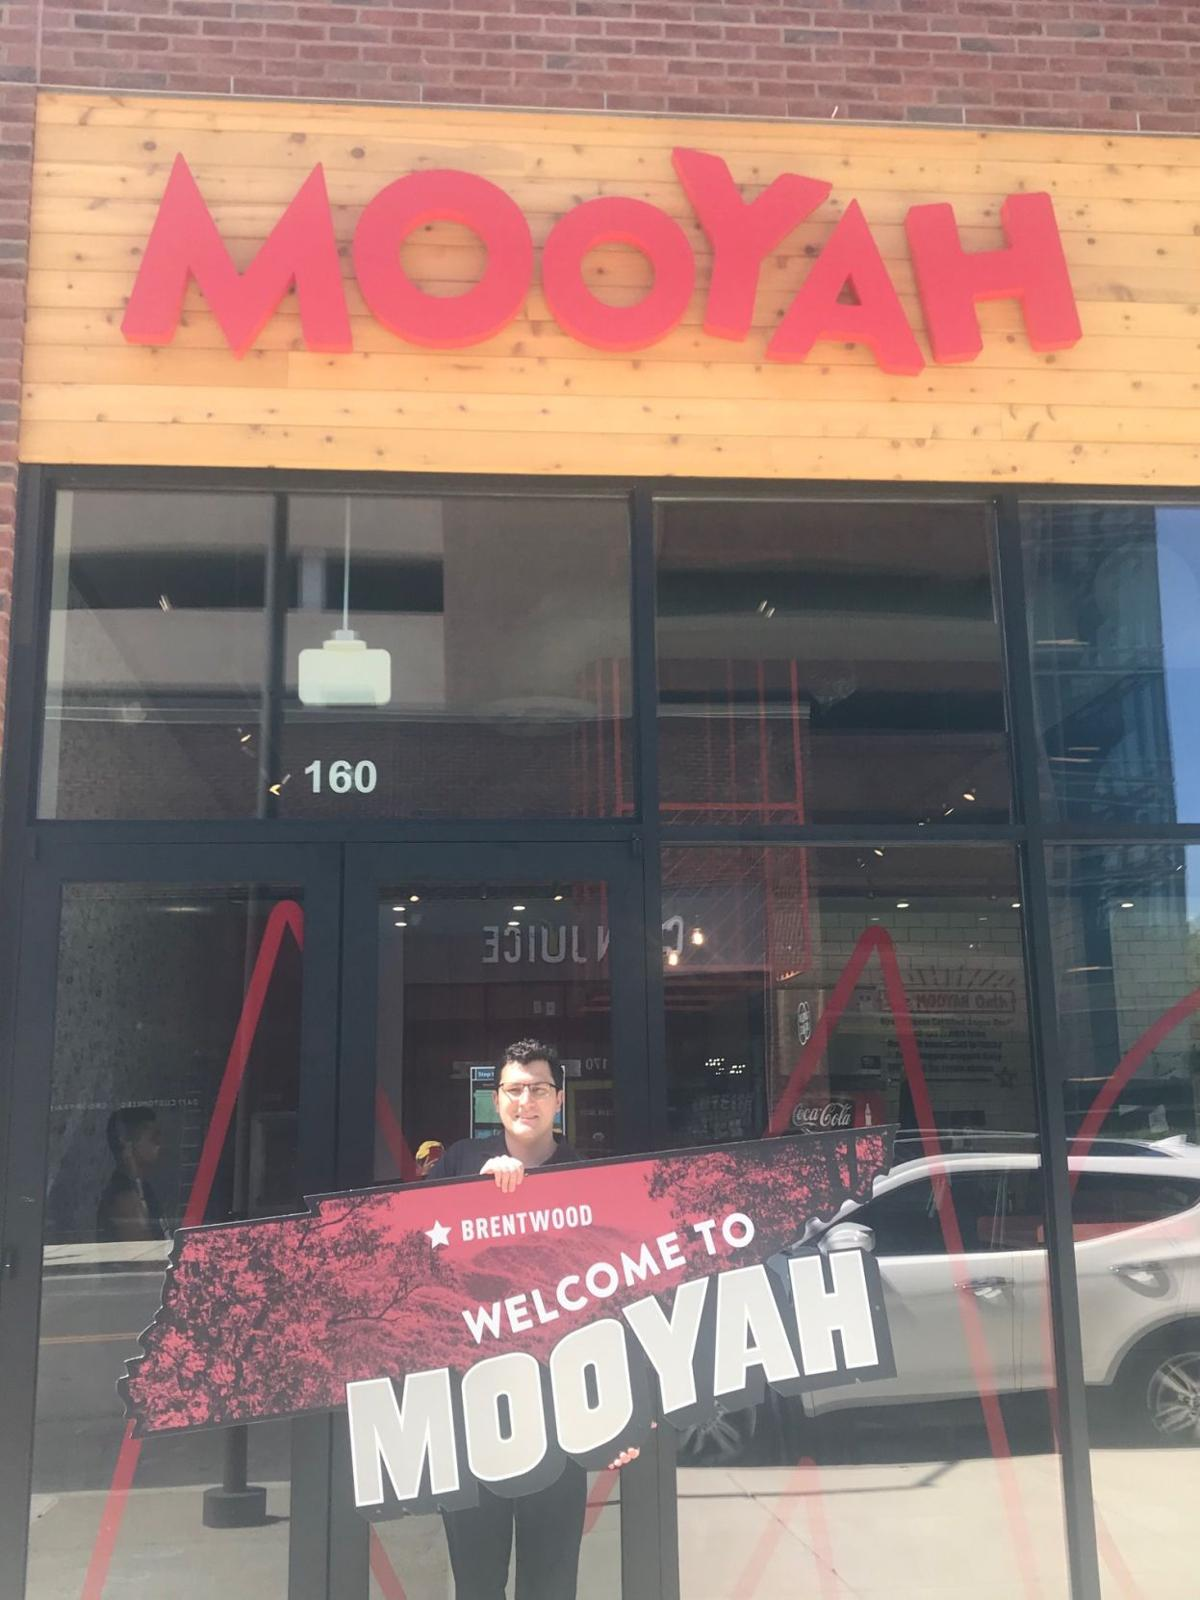 Mooyah Brentwood